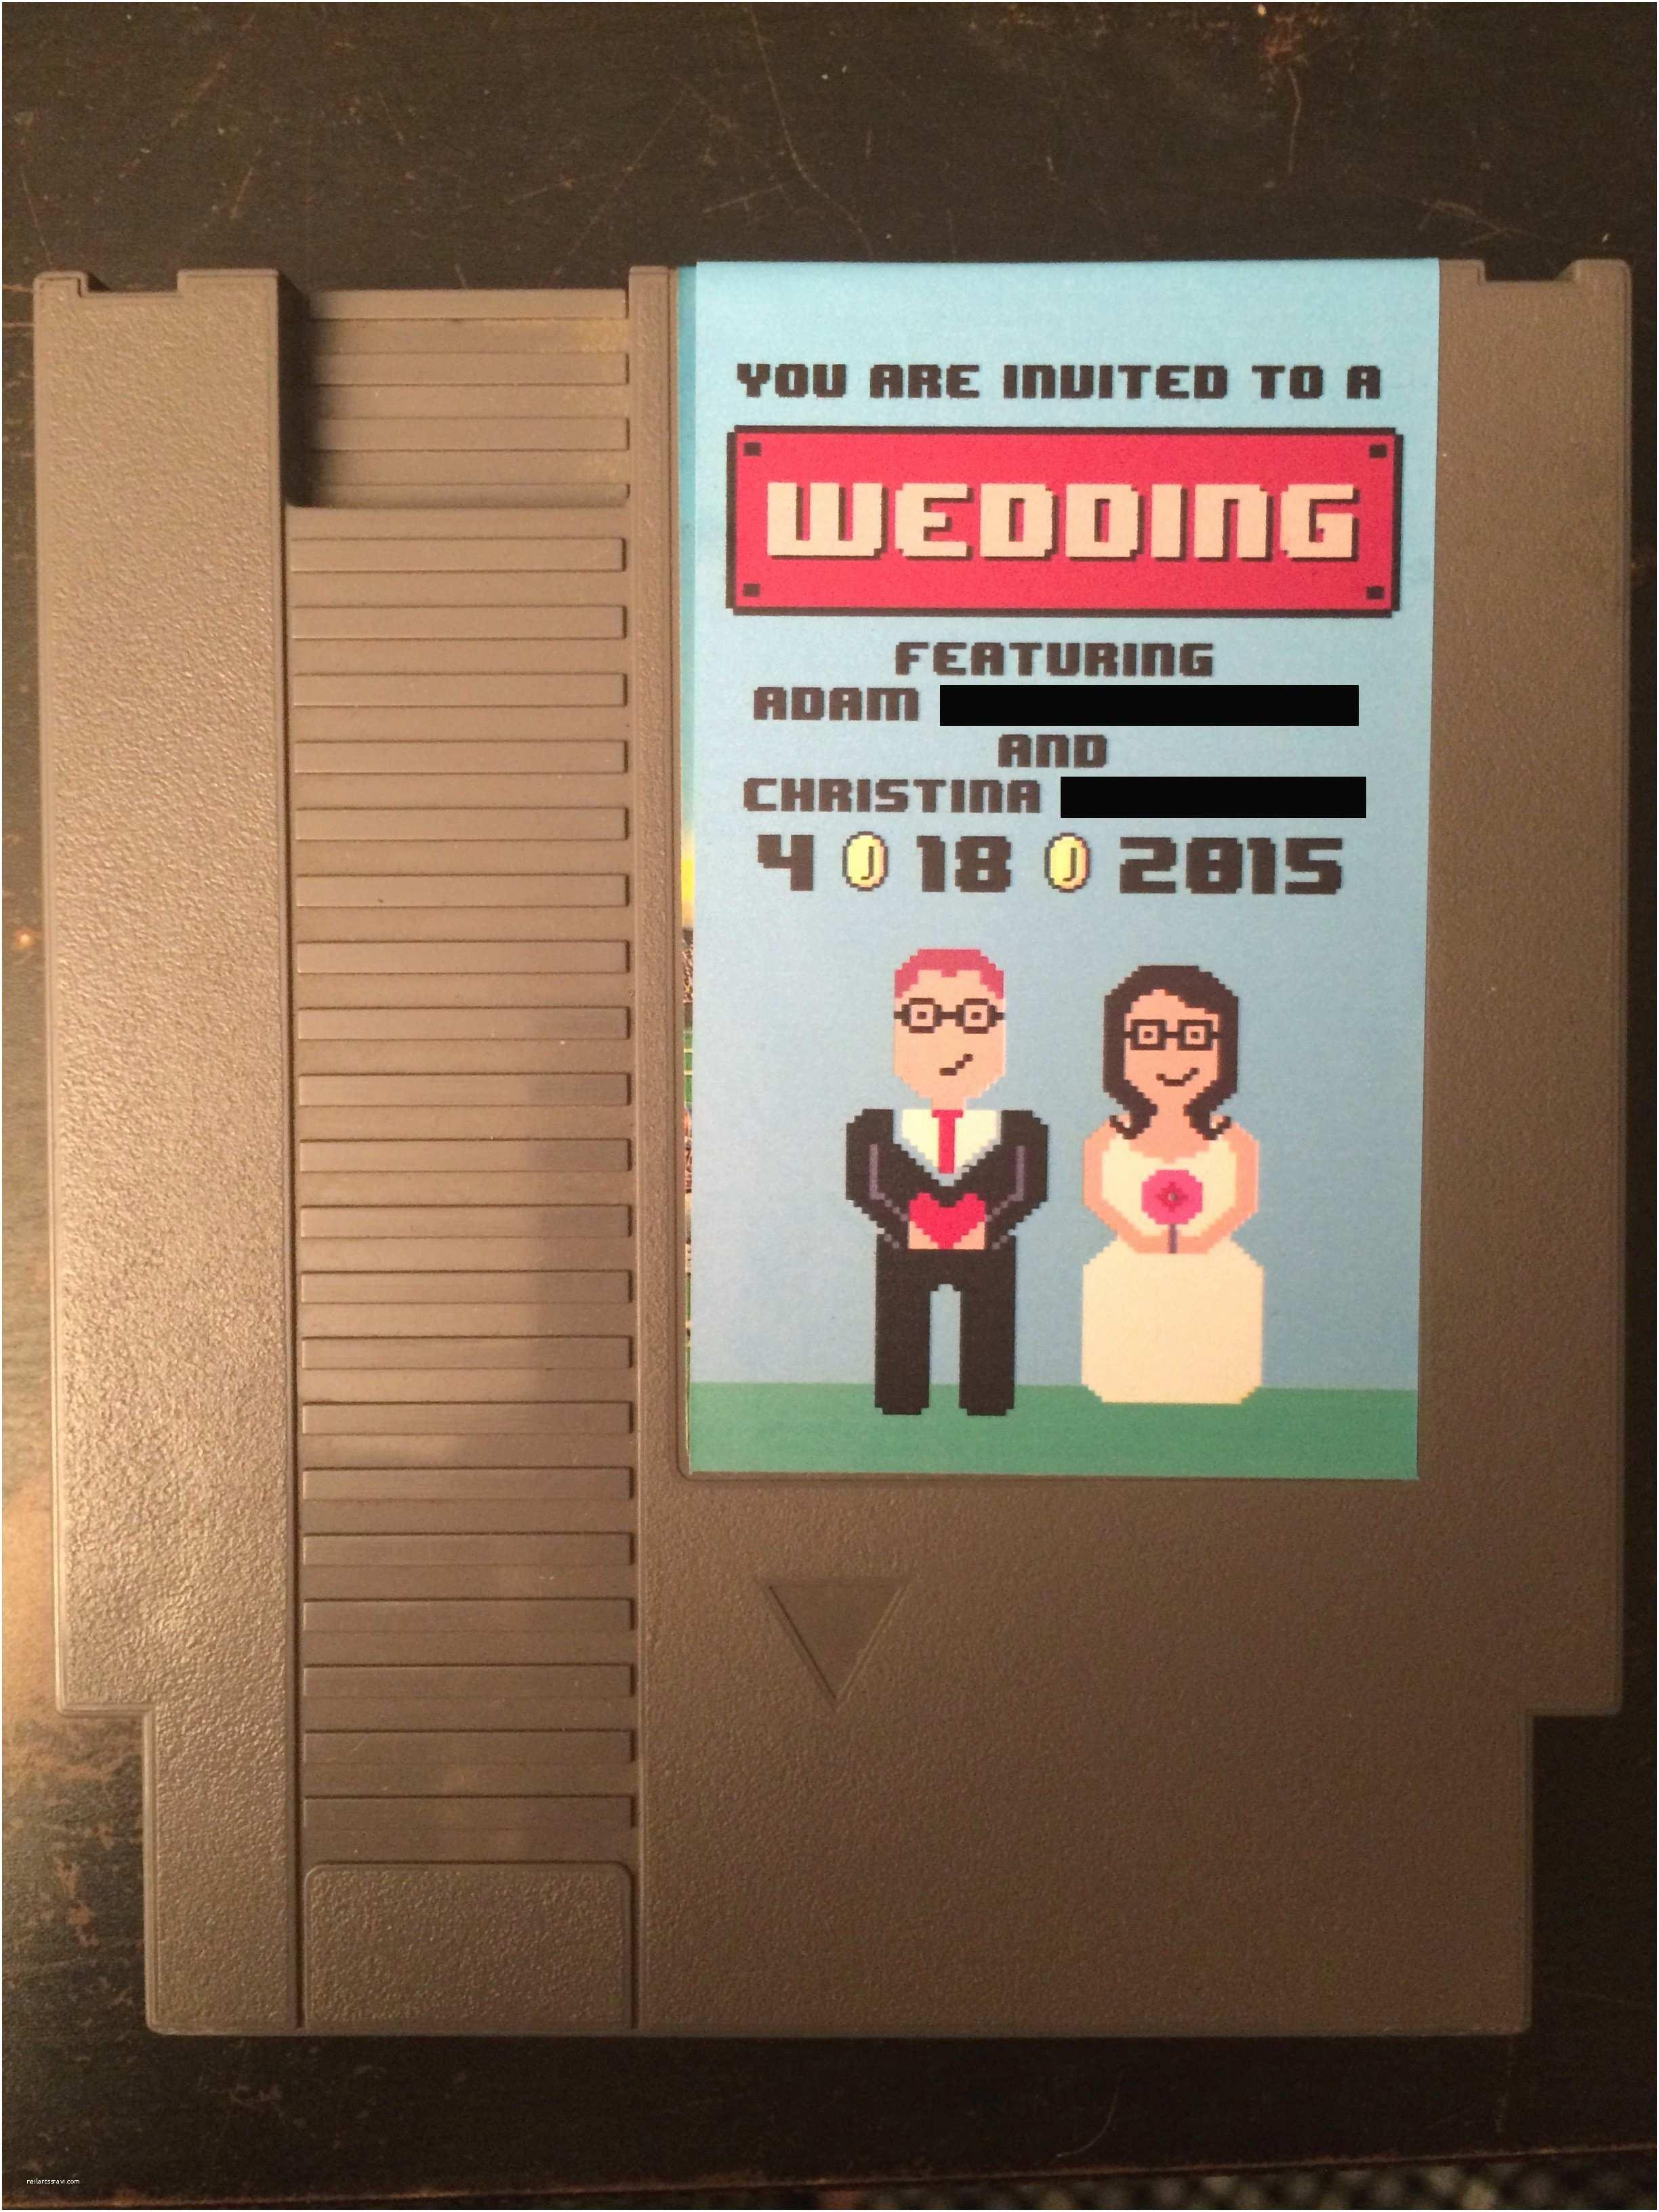 Nerdy Wedding Invitations the 15 Most Delightfully Geeky Wedding Invitations